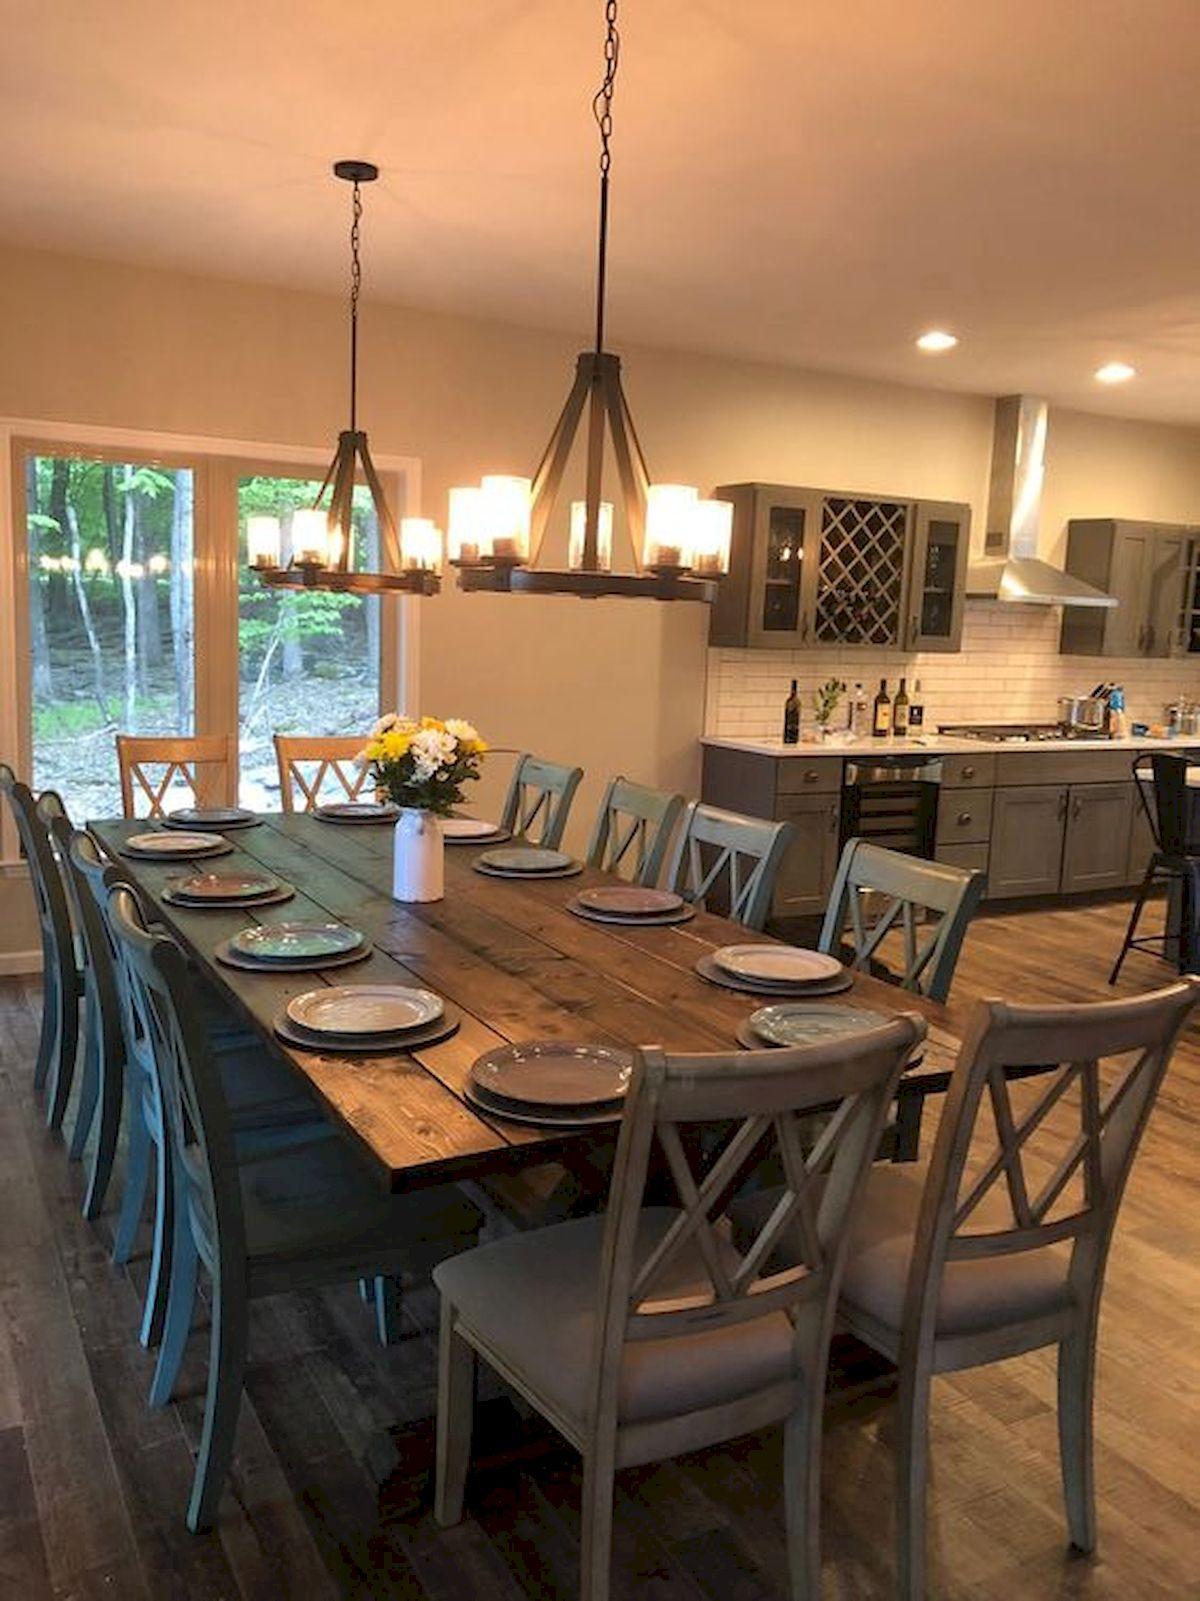 40 Adorable Farmhouse Dining Room Design And Decor Ideas (23)